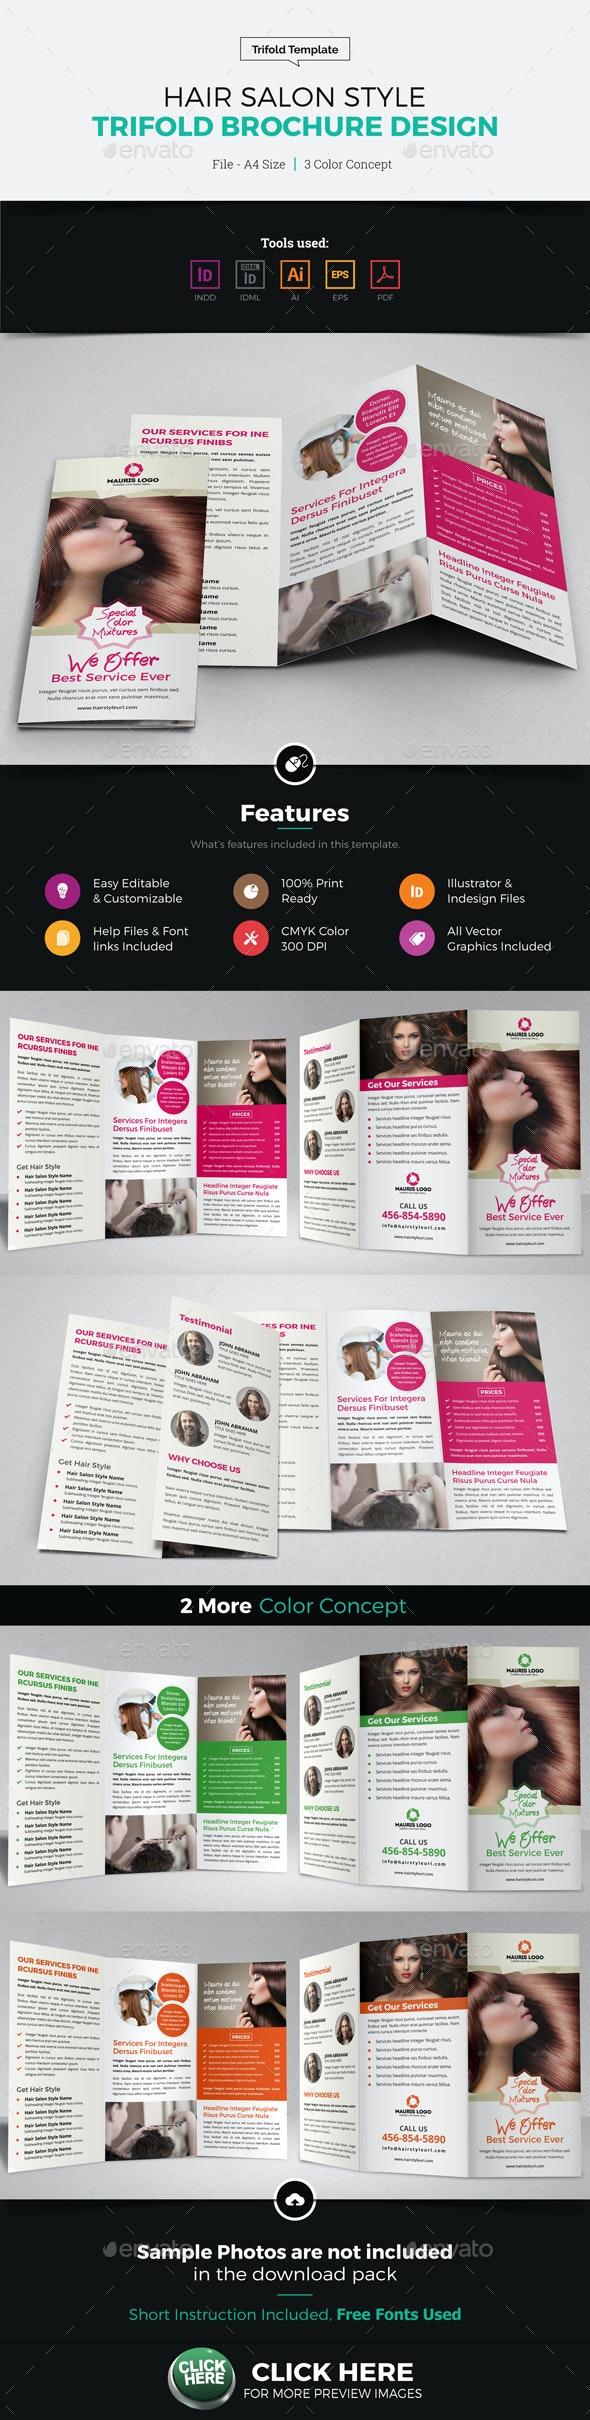 Hair Salon Style Trifold Brochure Design - Corporate Brochures